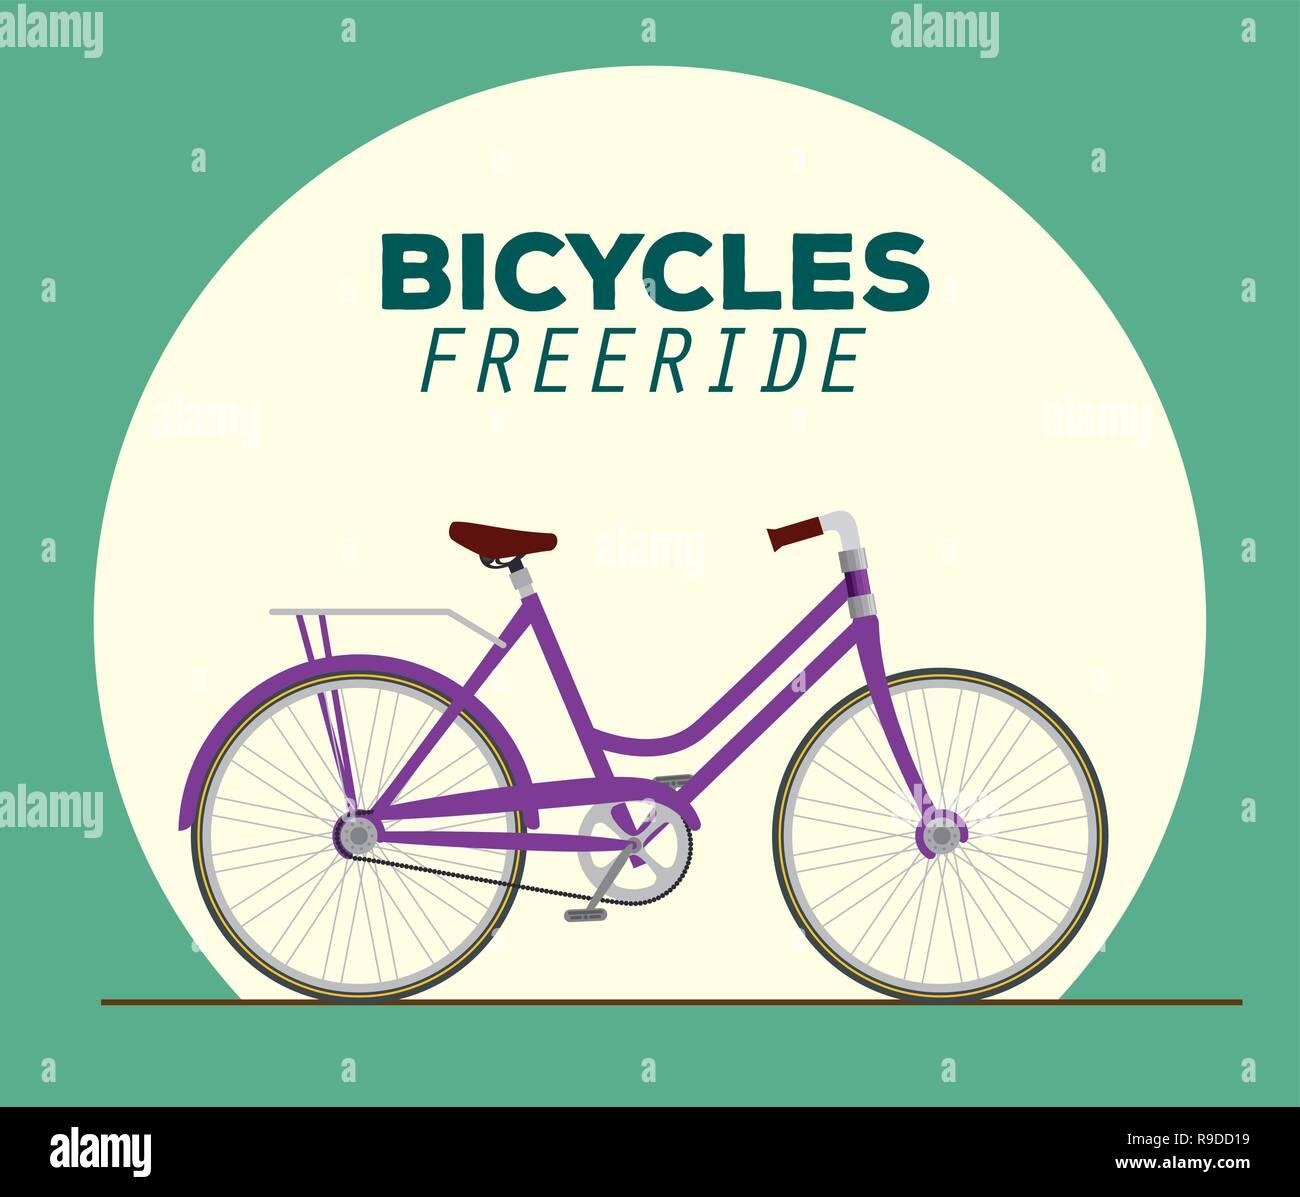 bicycle design transport vehicle to freeride - Stock Image